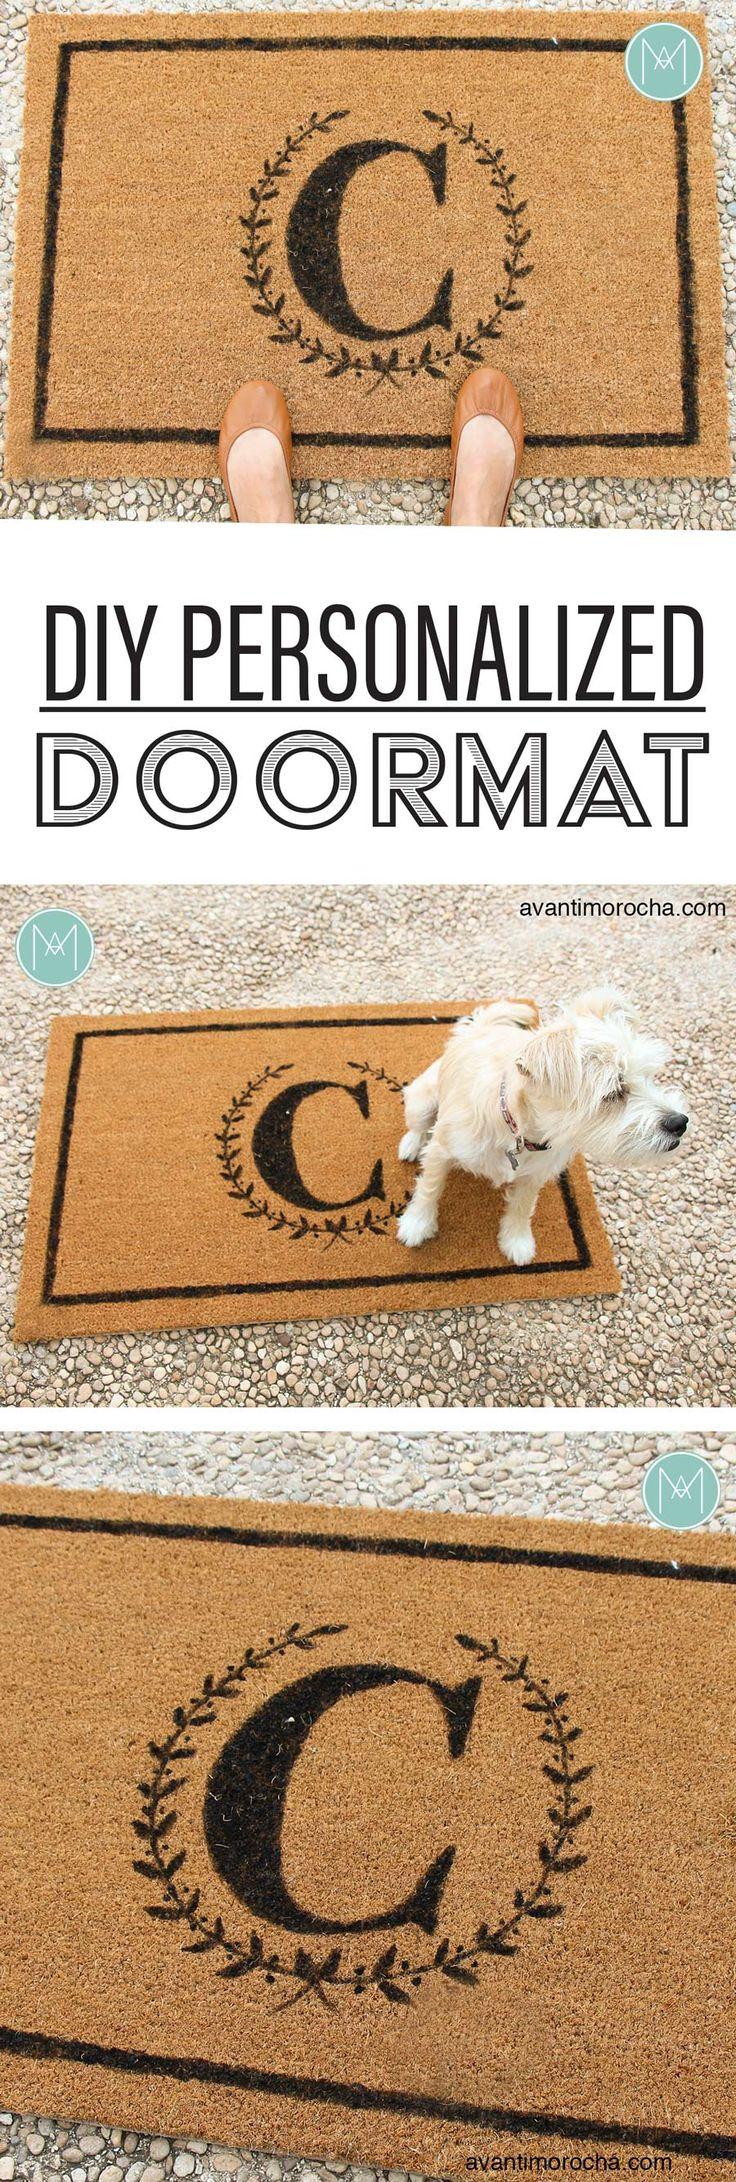 DIY Personalized Doormat –  Tapete personalizado / IKEA Trampa AvantiMorocha Blog